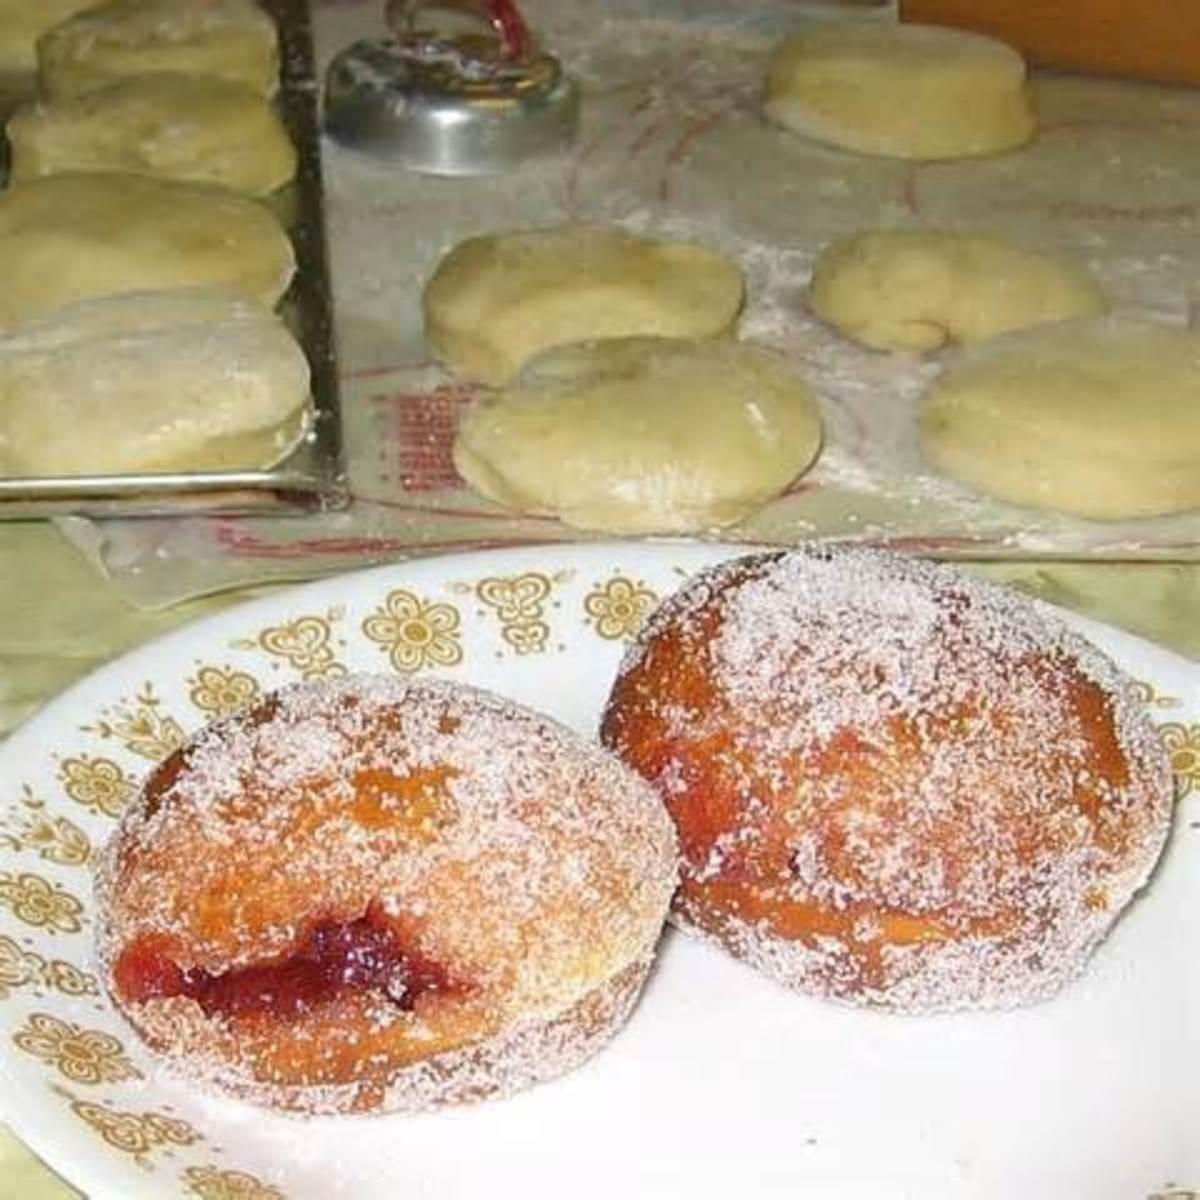 filled paczki sprinkled with sugar